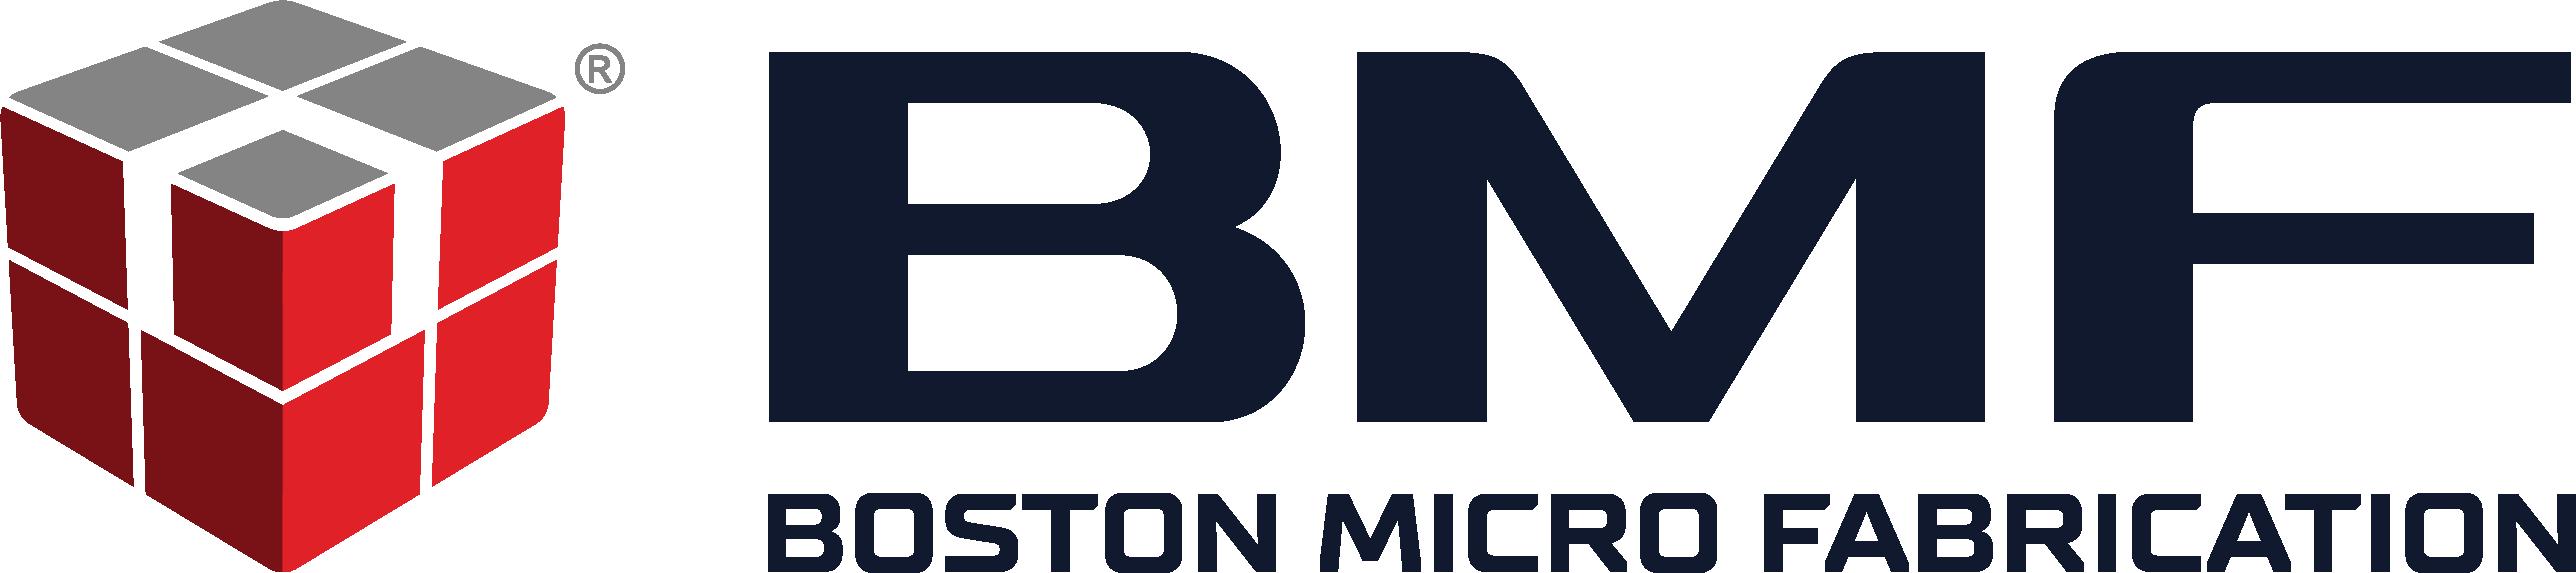 BMF Japan株式会社-ロゴ